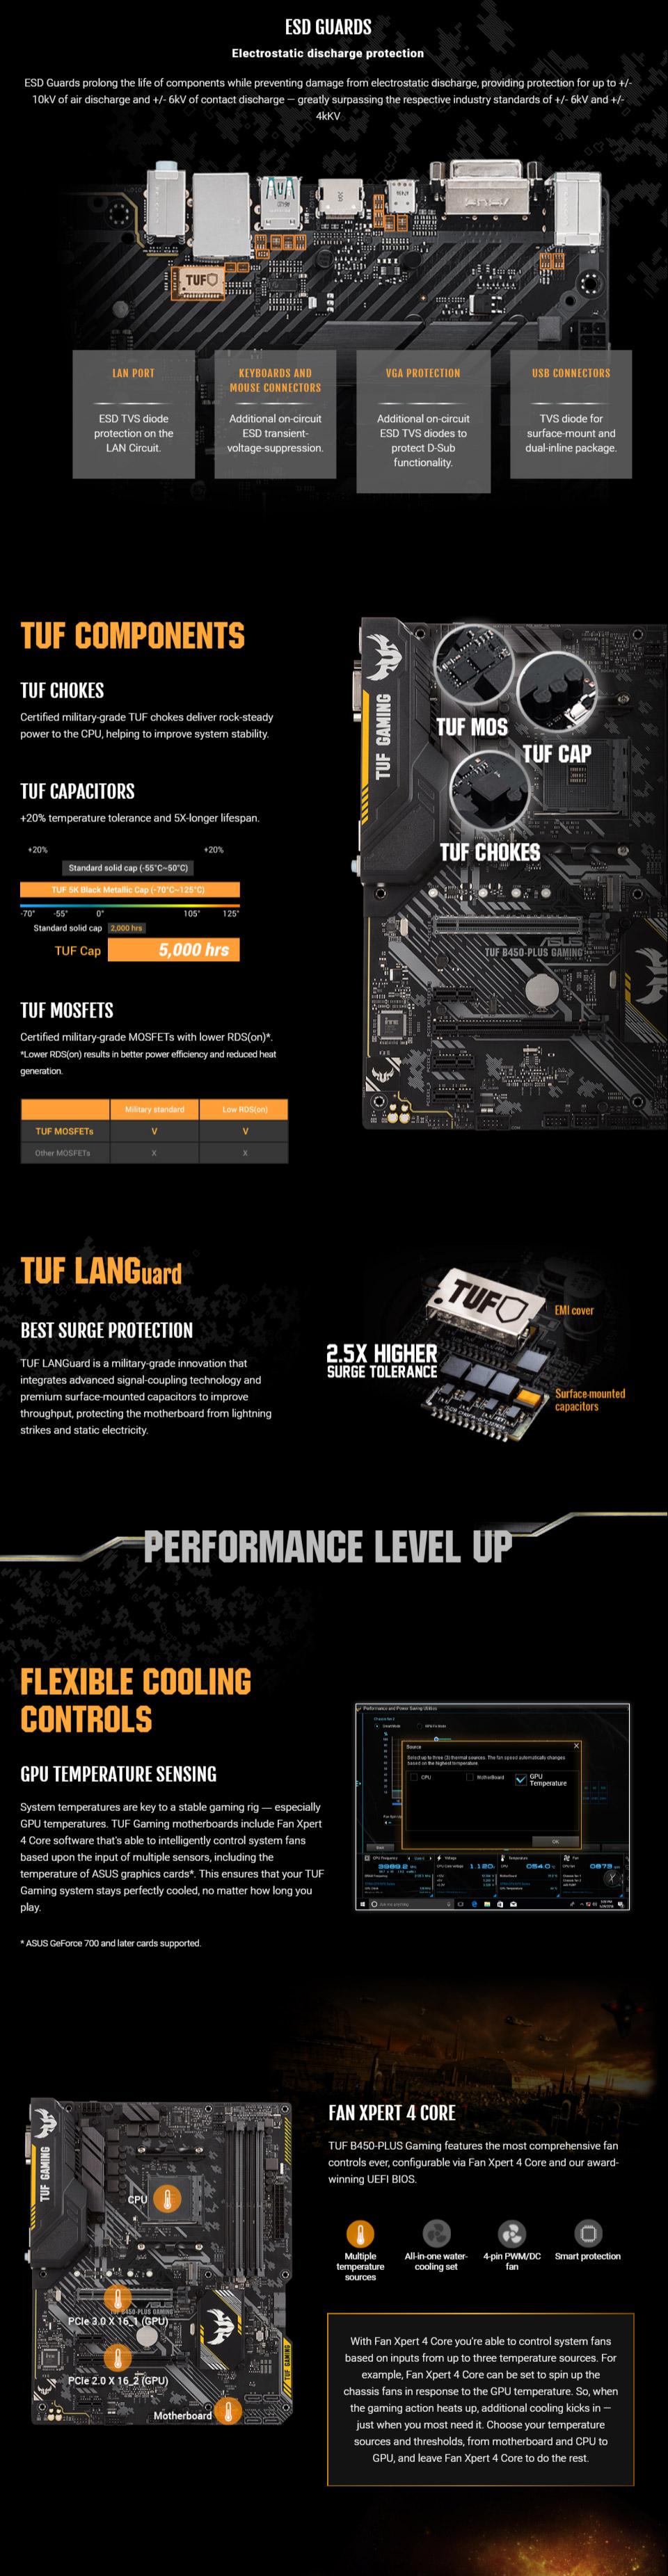 Buy the ASUS TUF B450-PLUS GAMING ATX For AMD Ryzen 2nd/3rd Gen